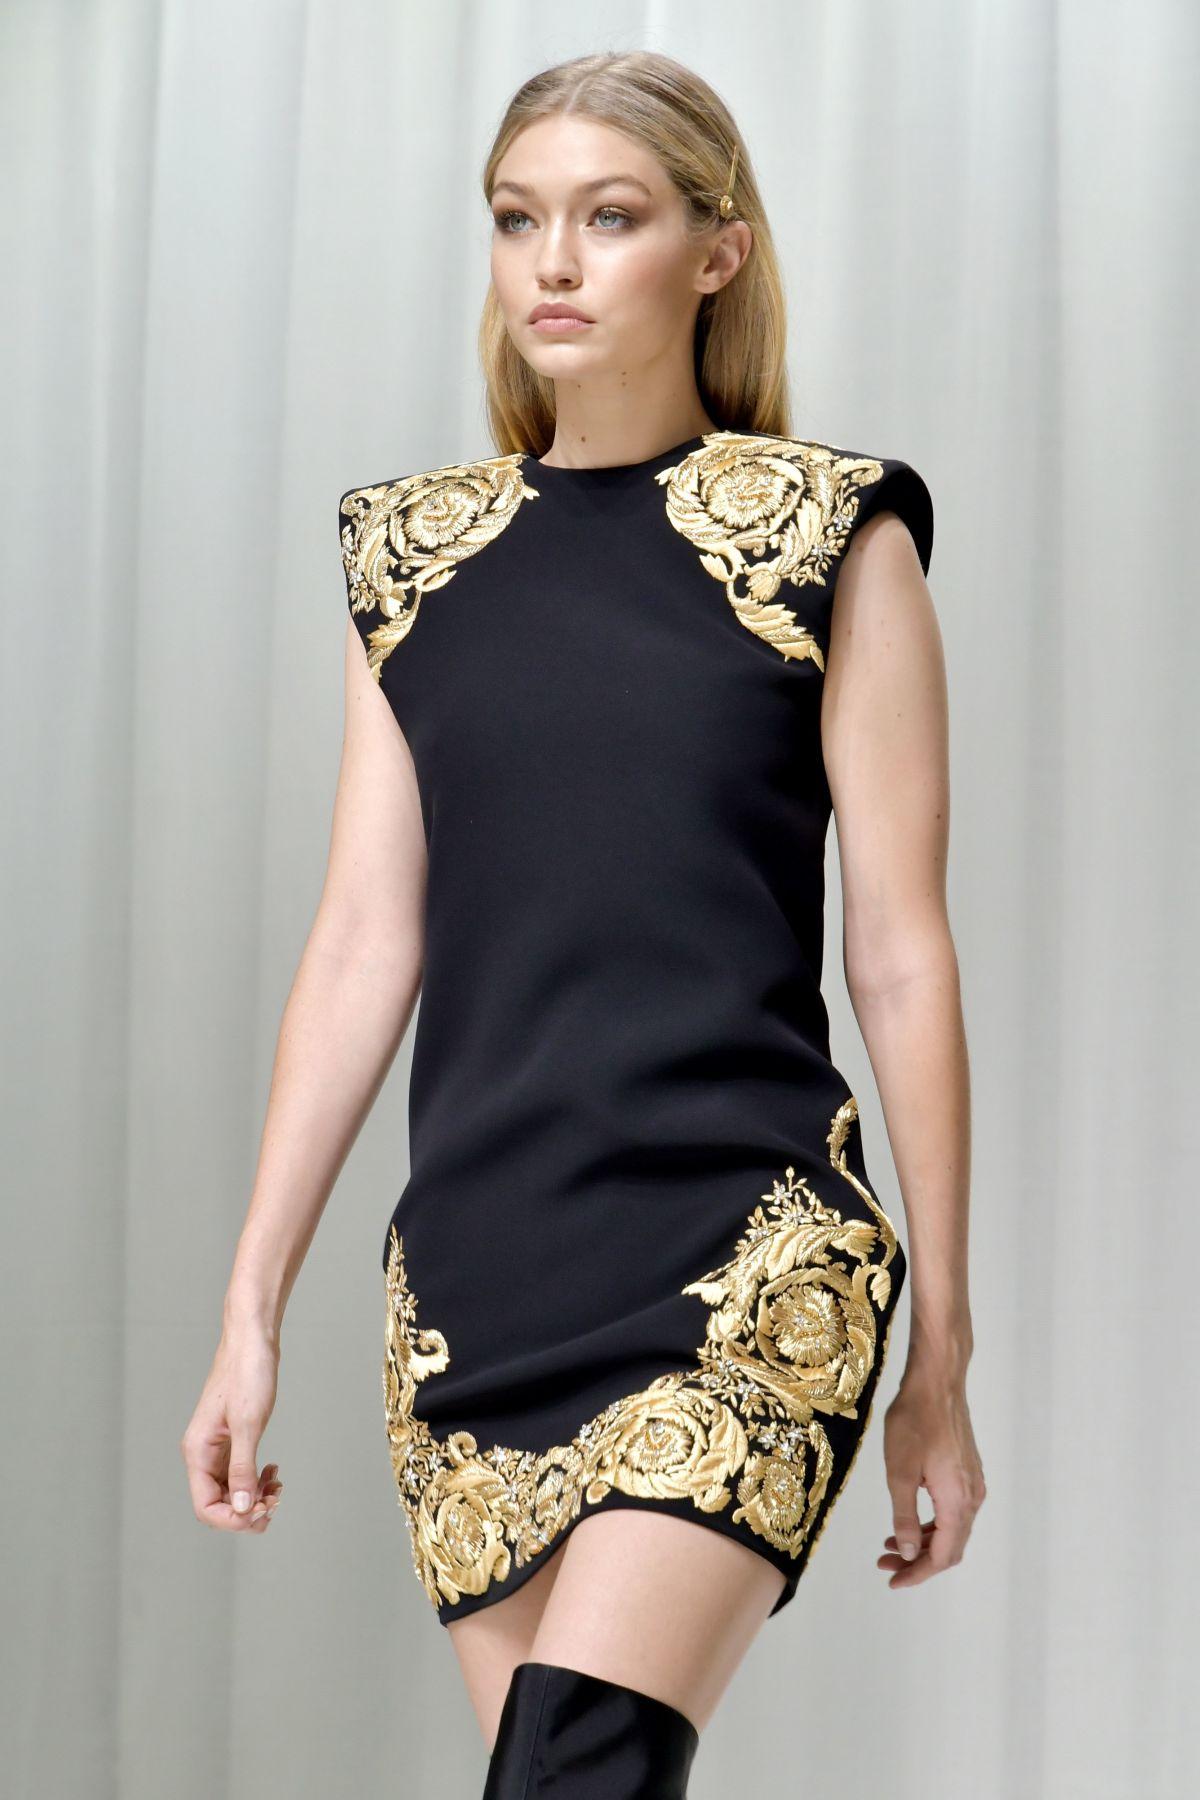 e04cc092ab GIGI HADID at Versace Fashion Show at Milan Fashion Week .